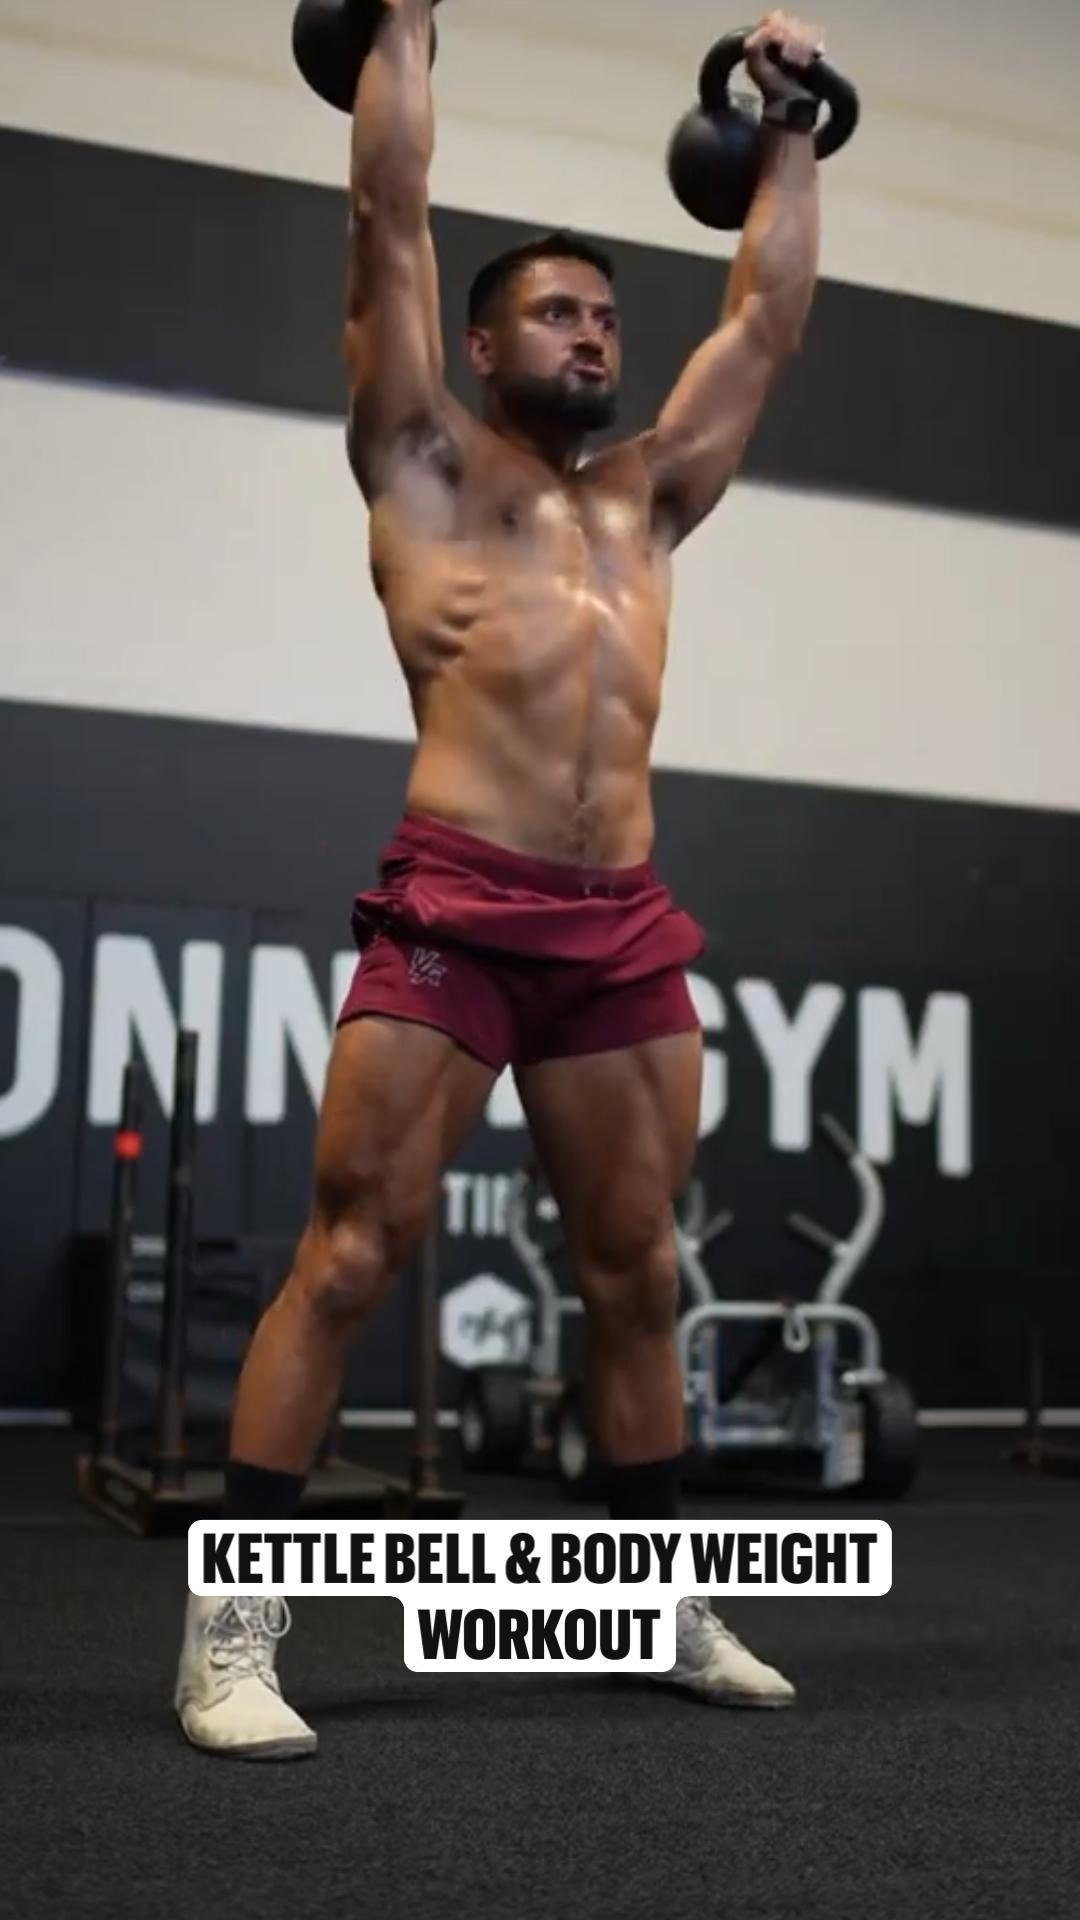 Kettle bell & body weight  Workout